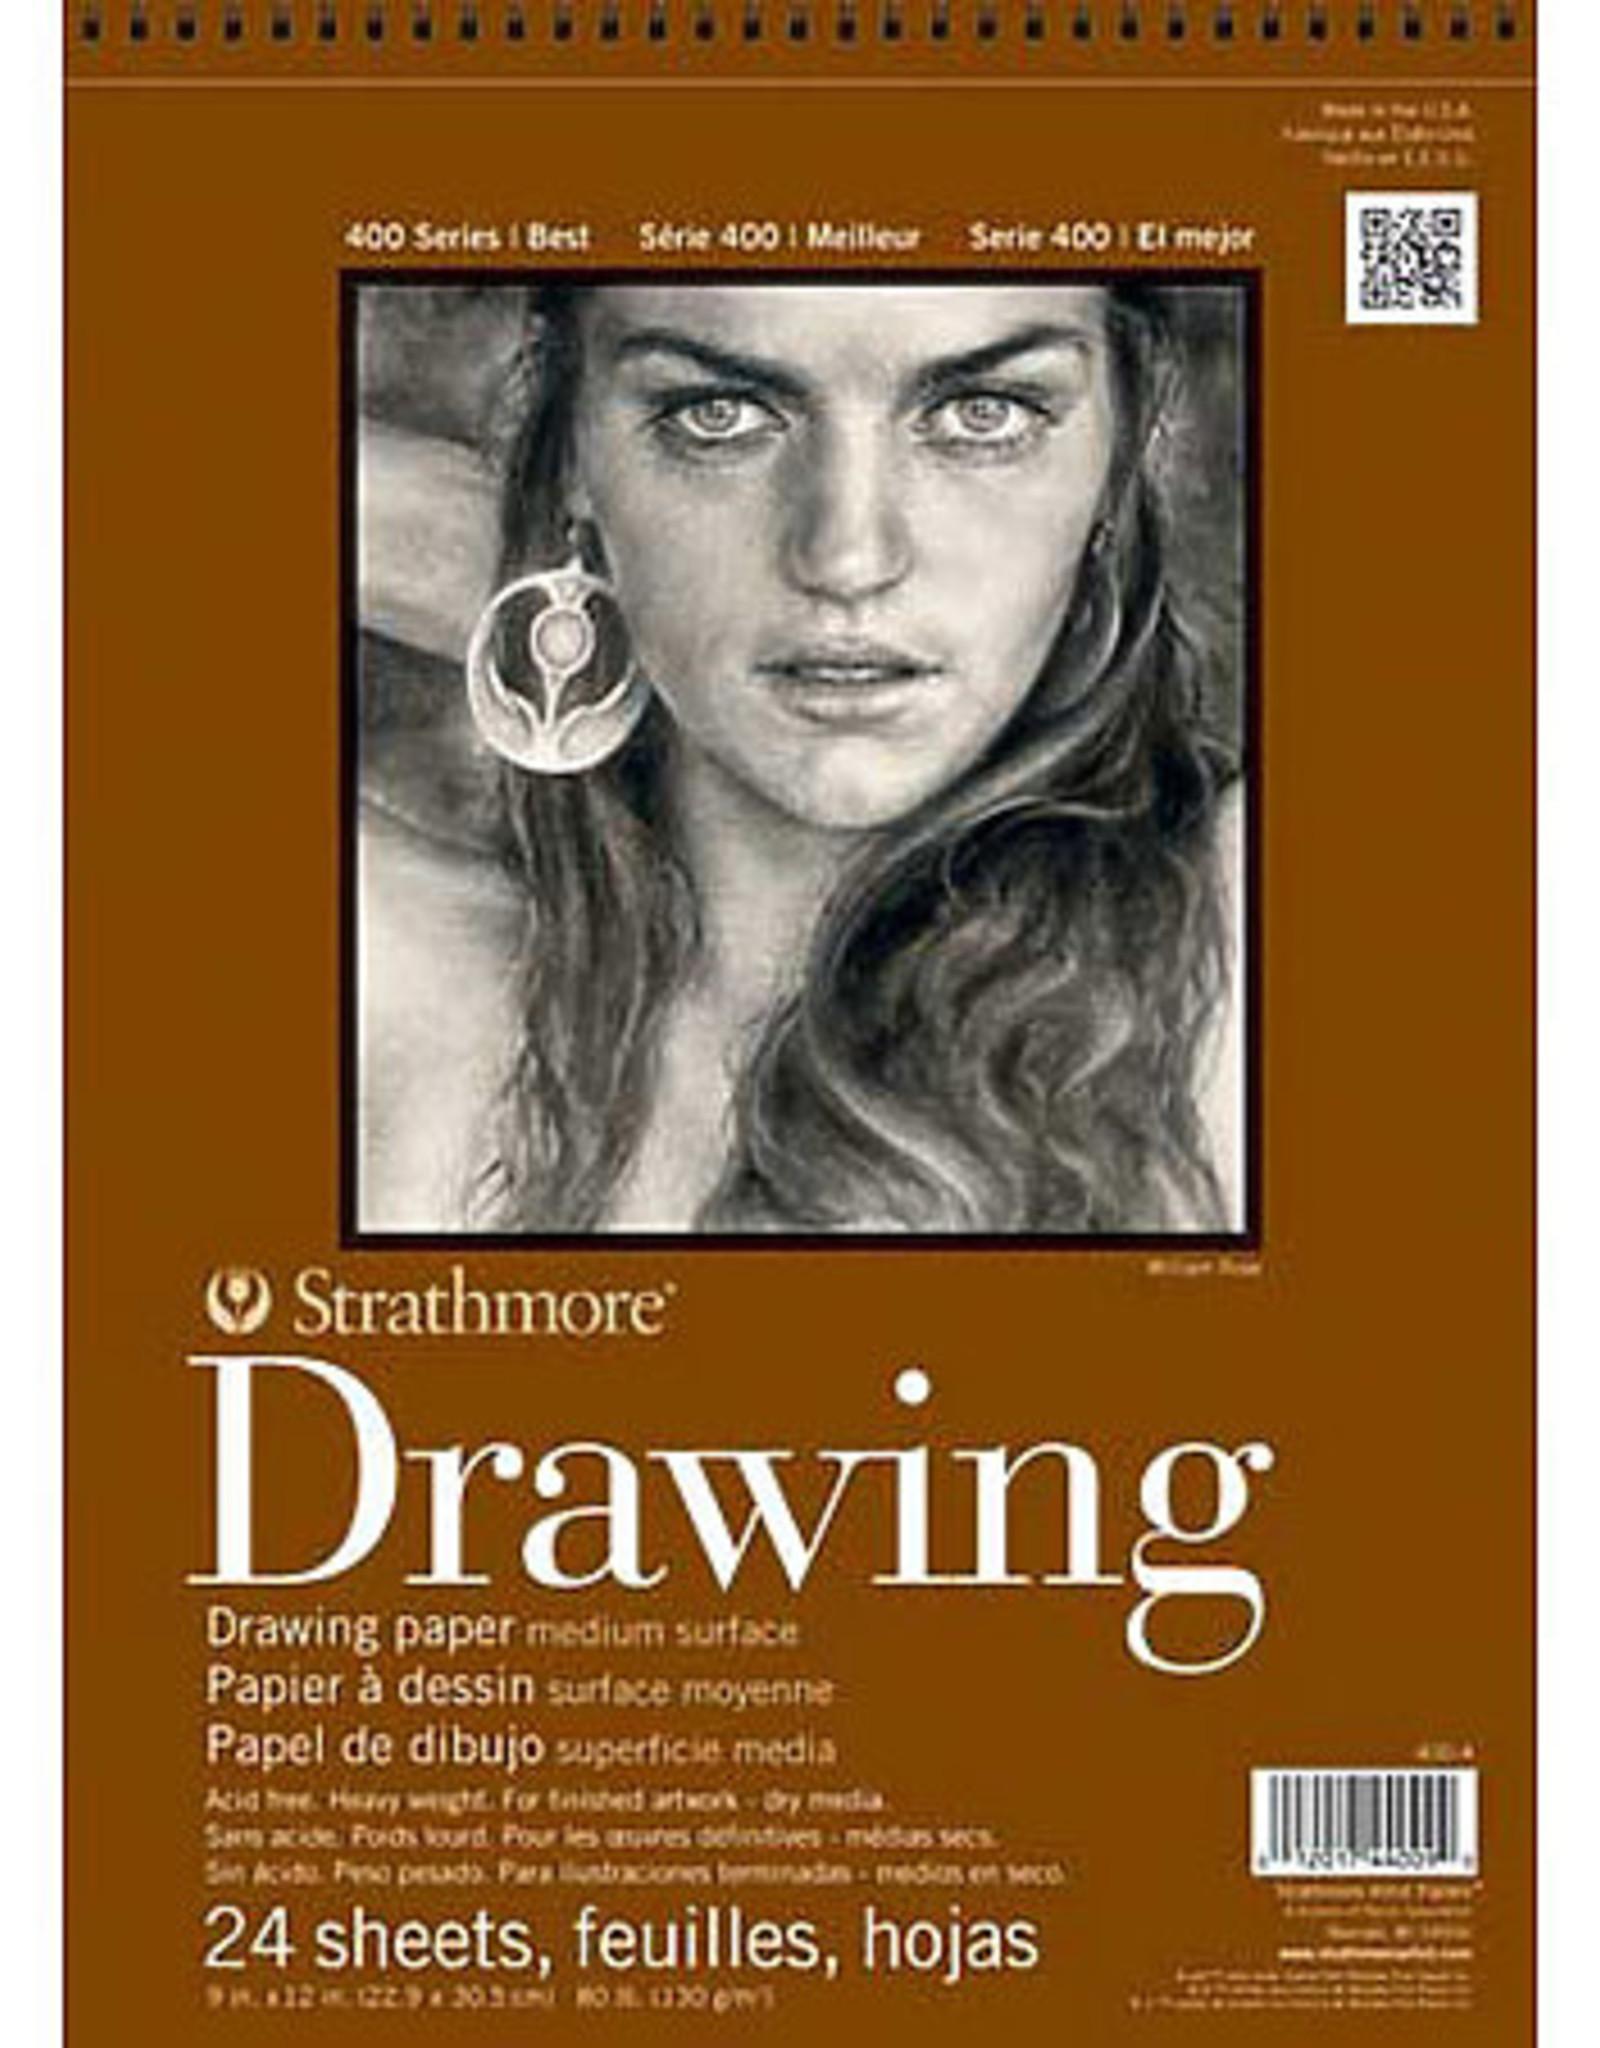 Drawing Paper Pad 400 Series 6x8